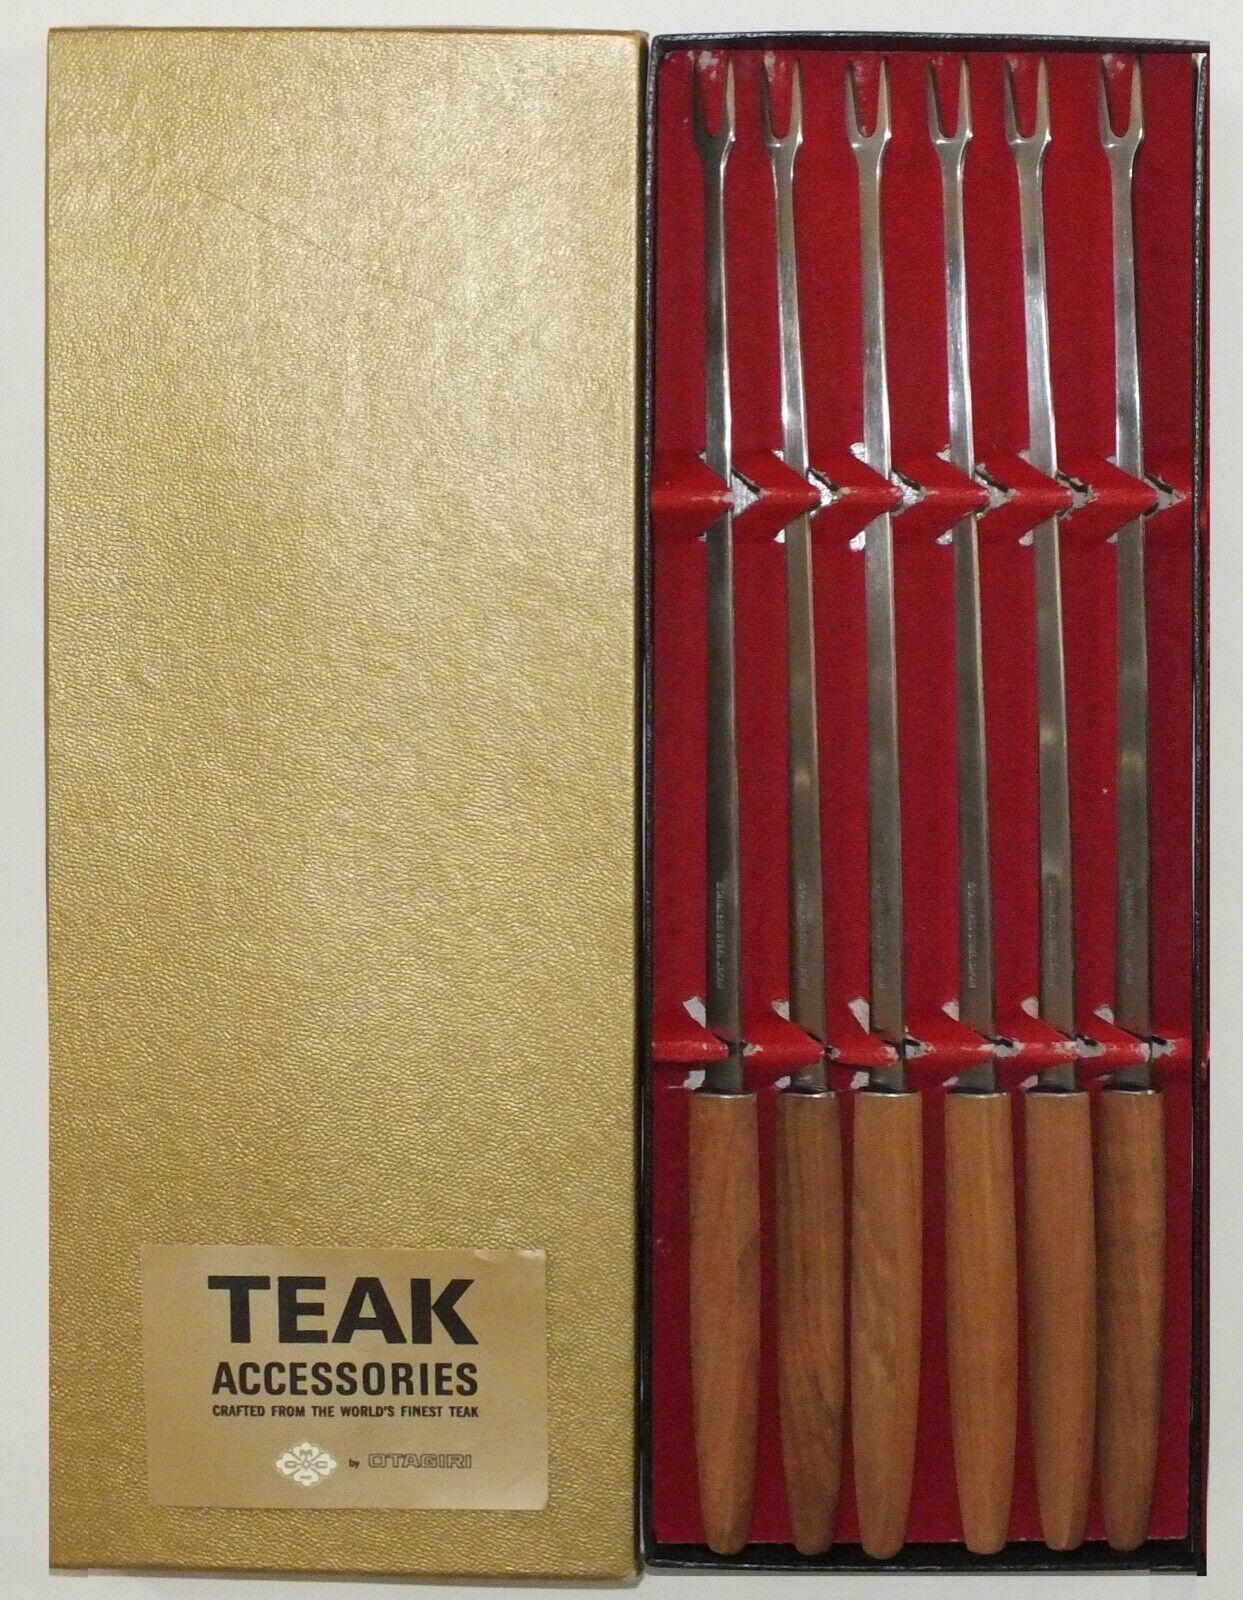 Otagiri Mercantile Company Teak And Stainless Steel Fondue Forks Japan - $25.00